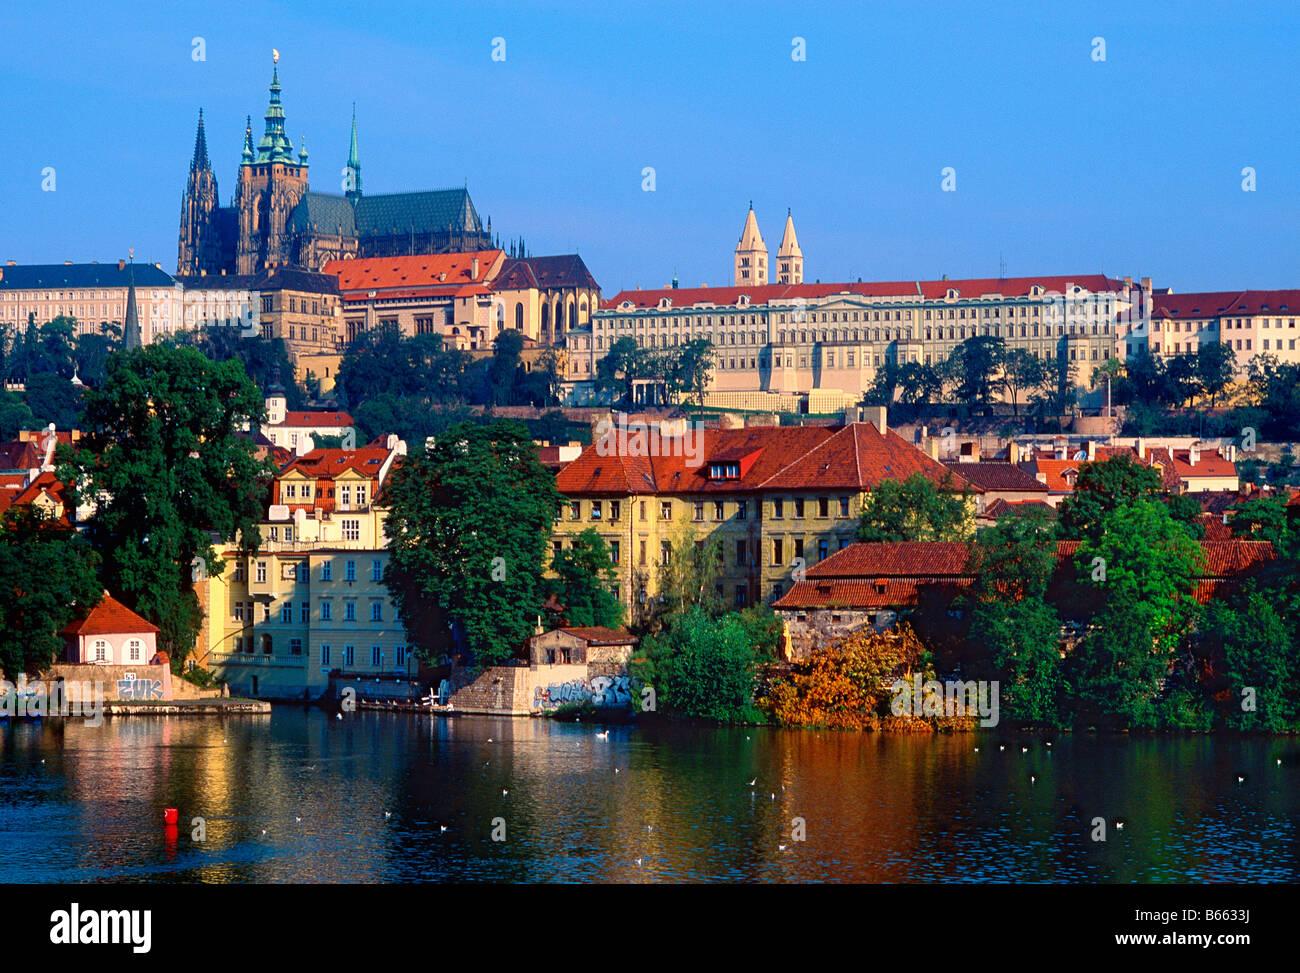 Vltava river in Prague Czech Republic - Stock Image